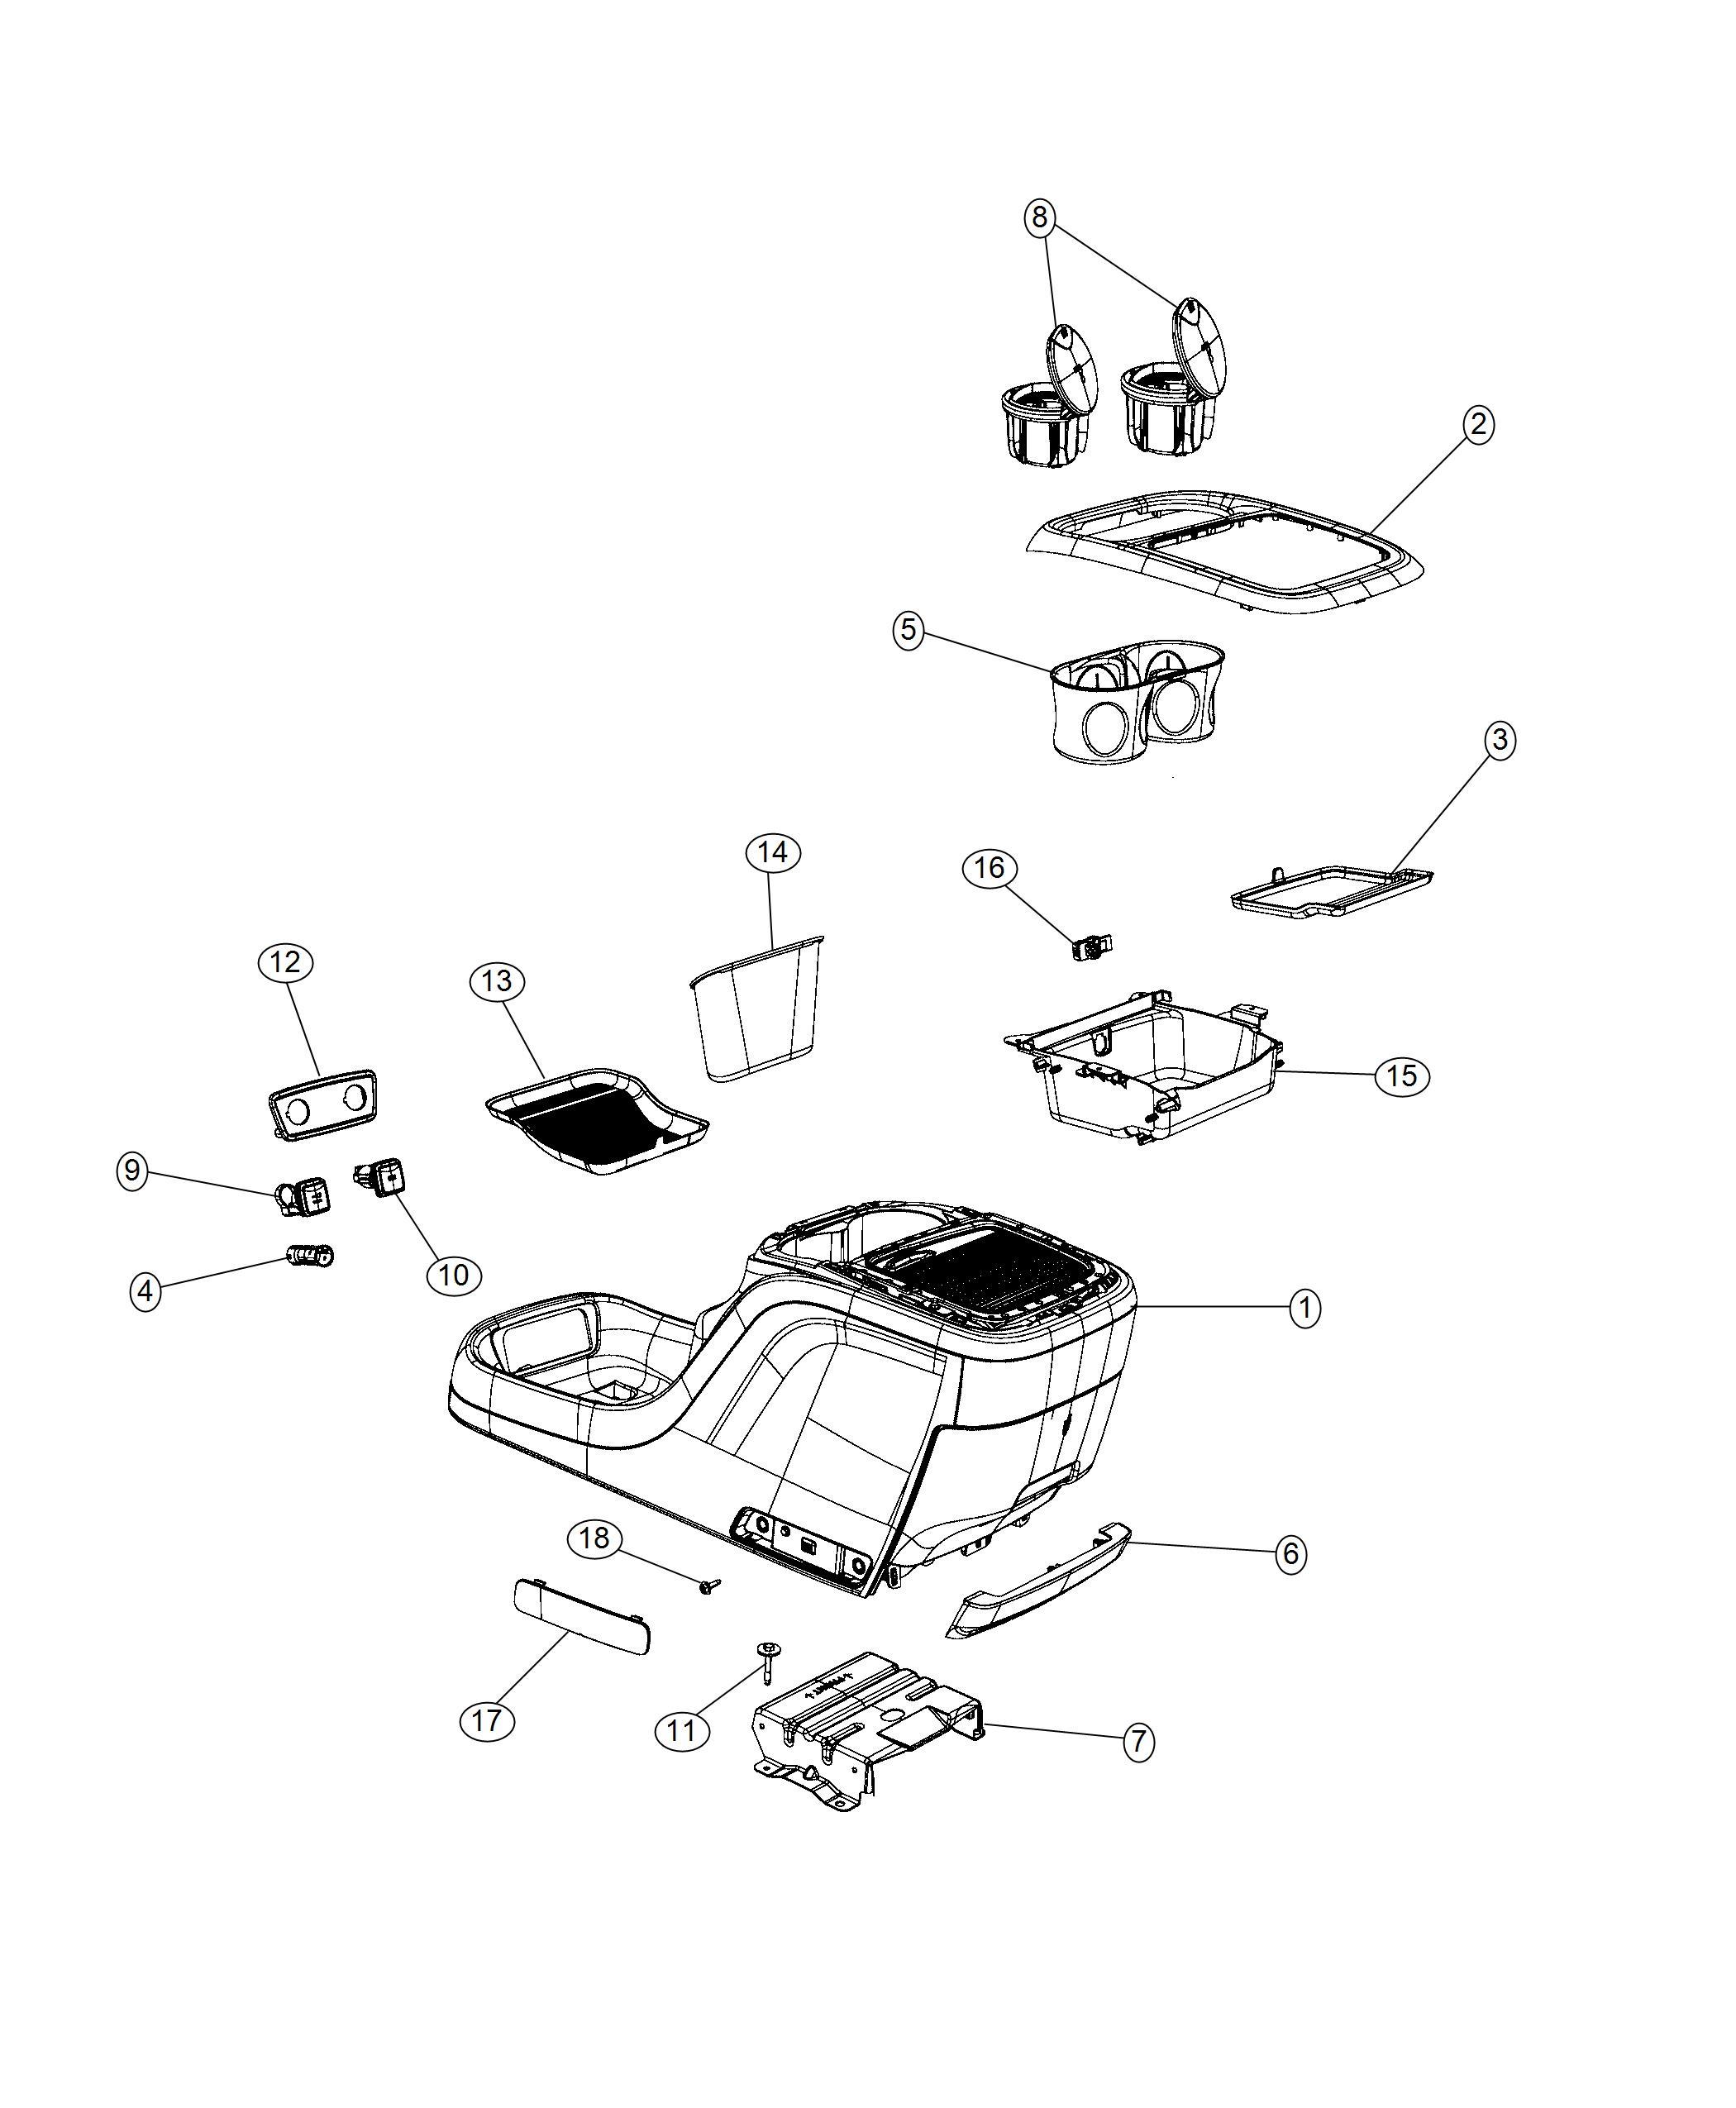 Chrysler Pacifica Console. Floor. Trim: [no description